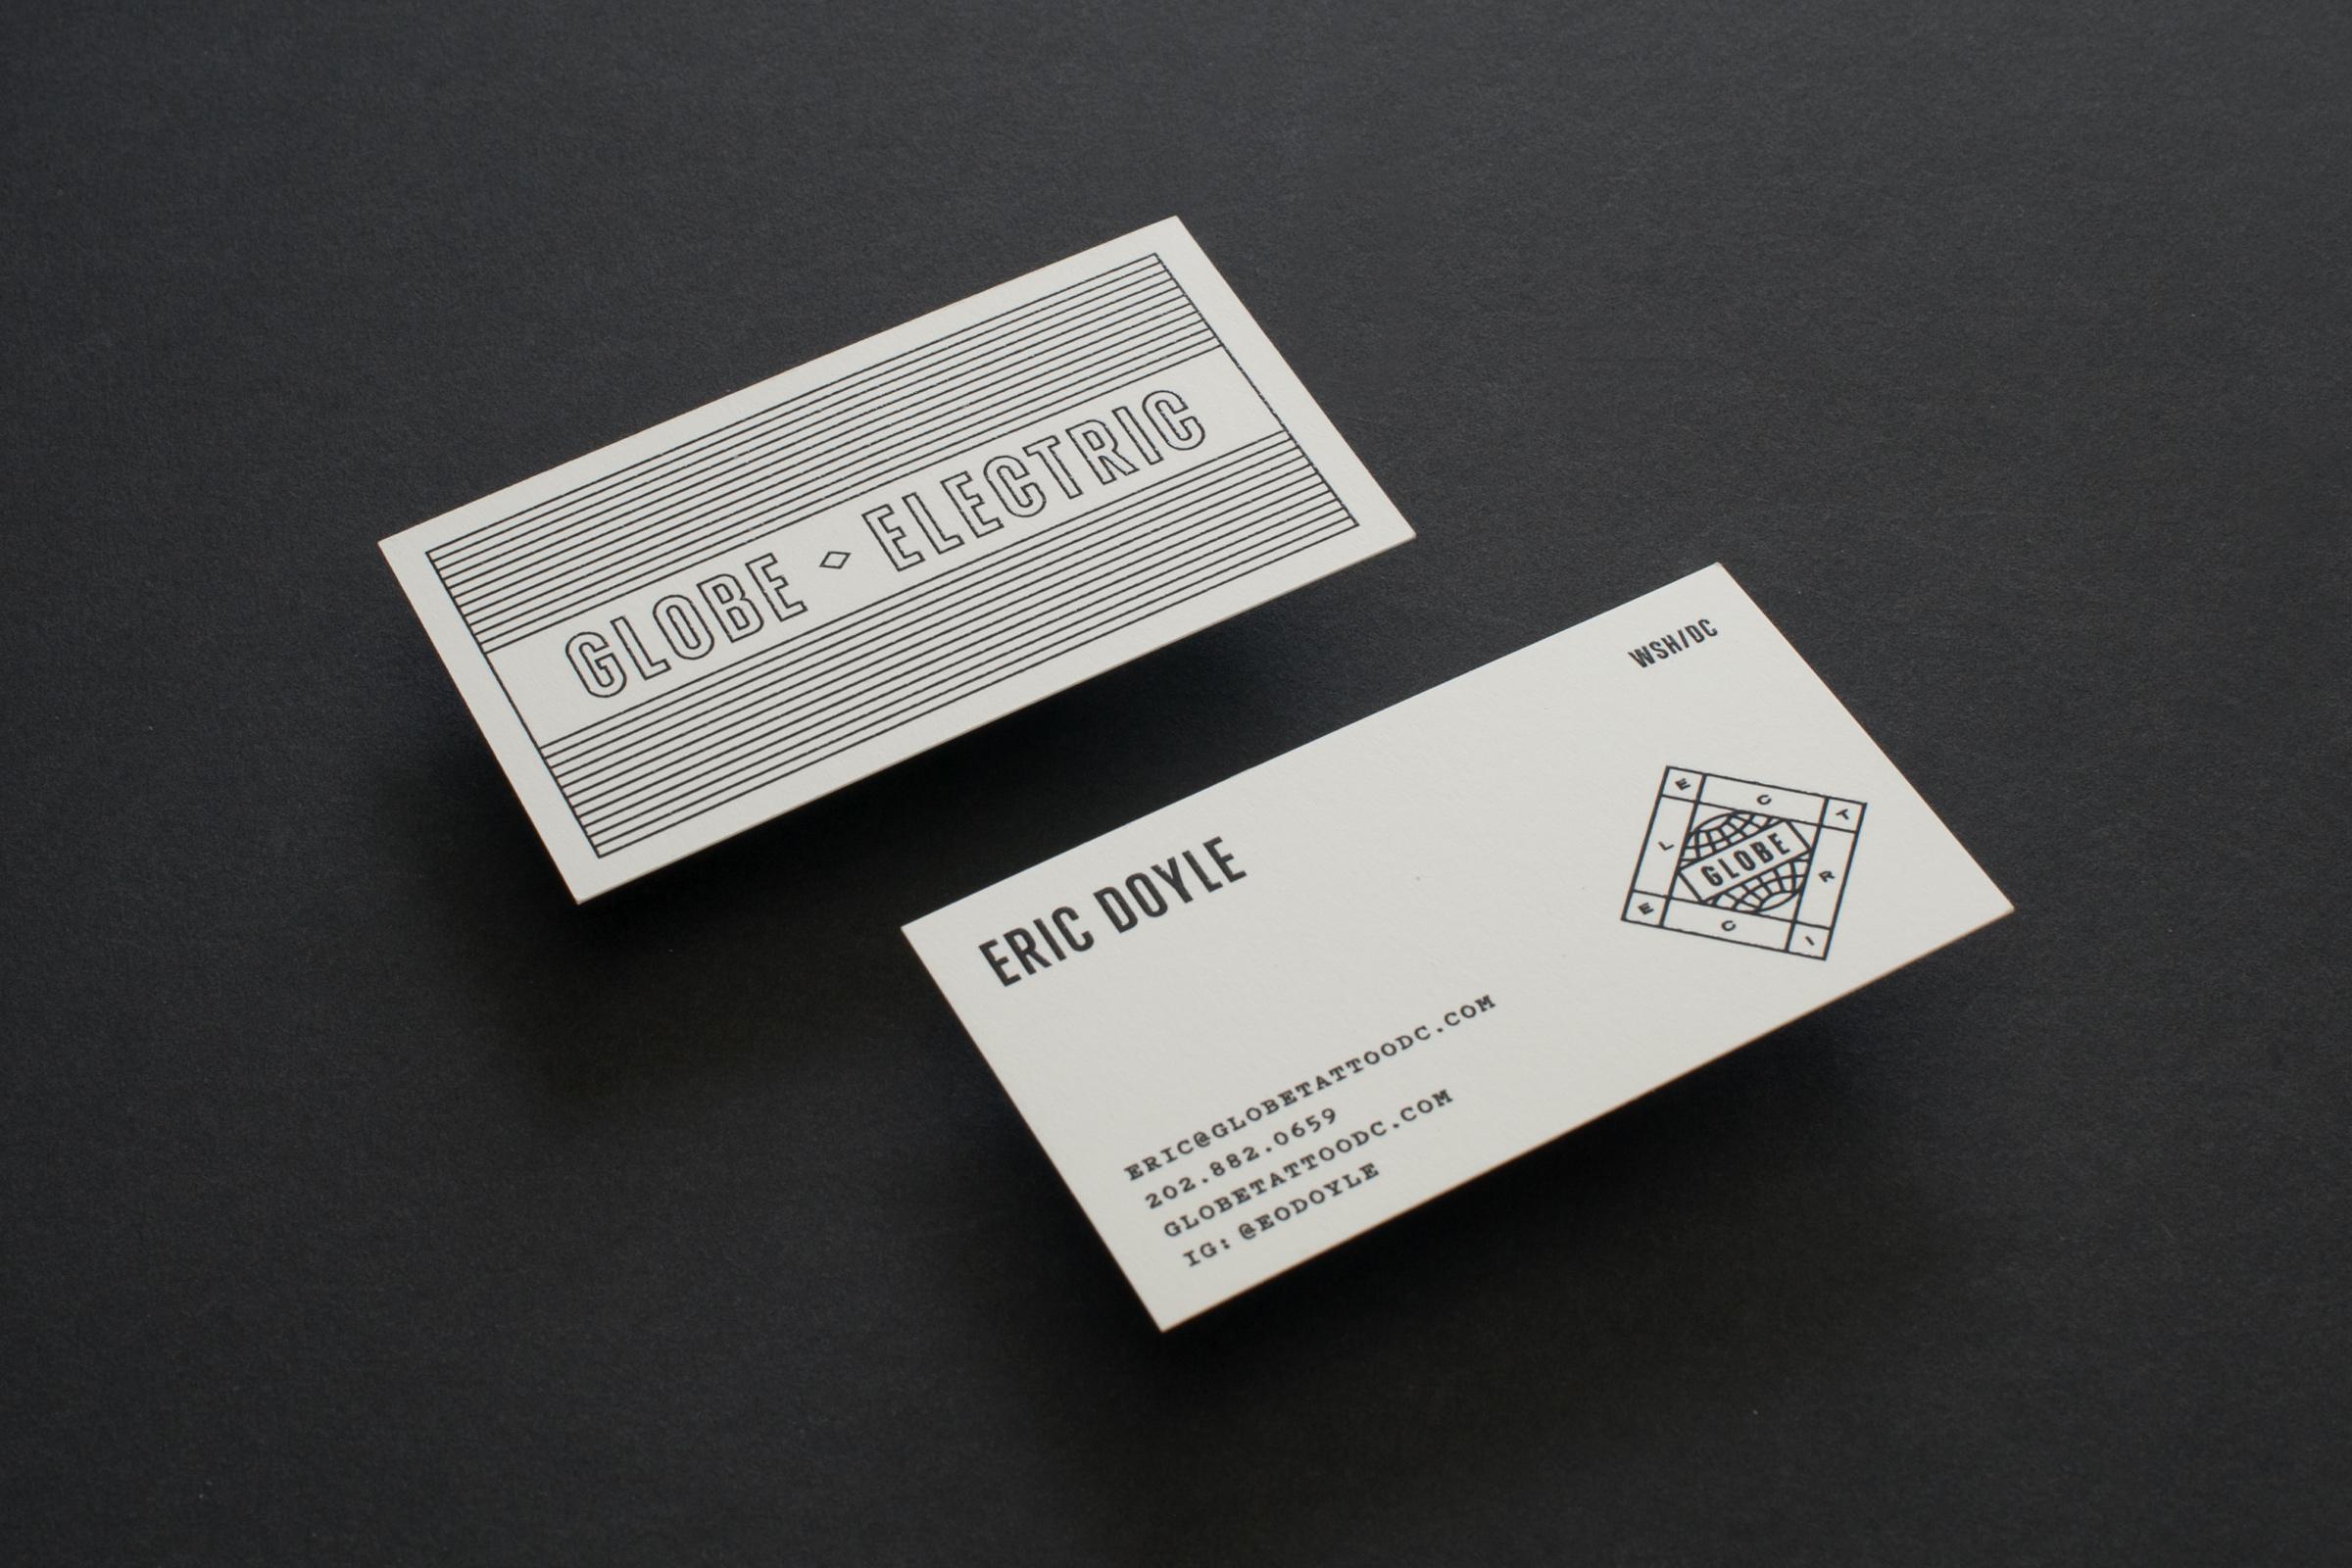 Globe_Electric_Tattoo_Branding_Design_1.jpg